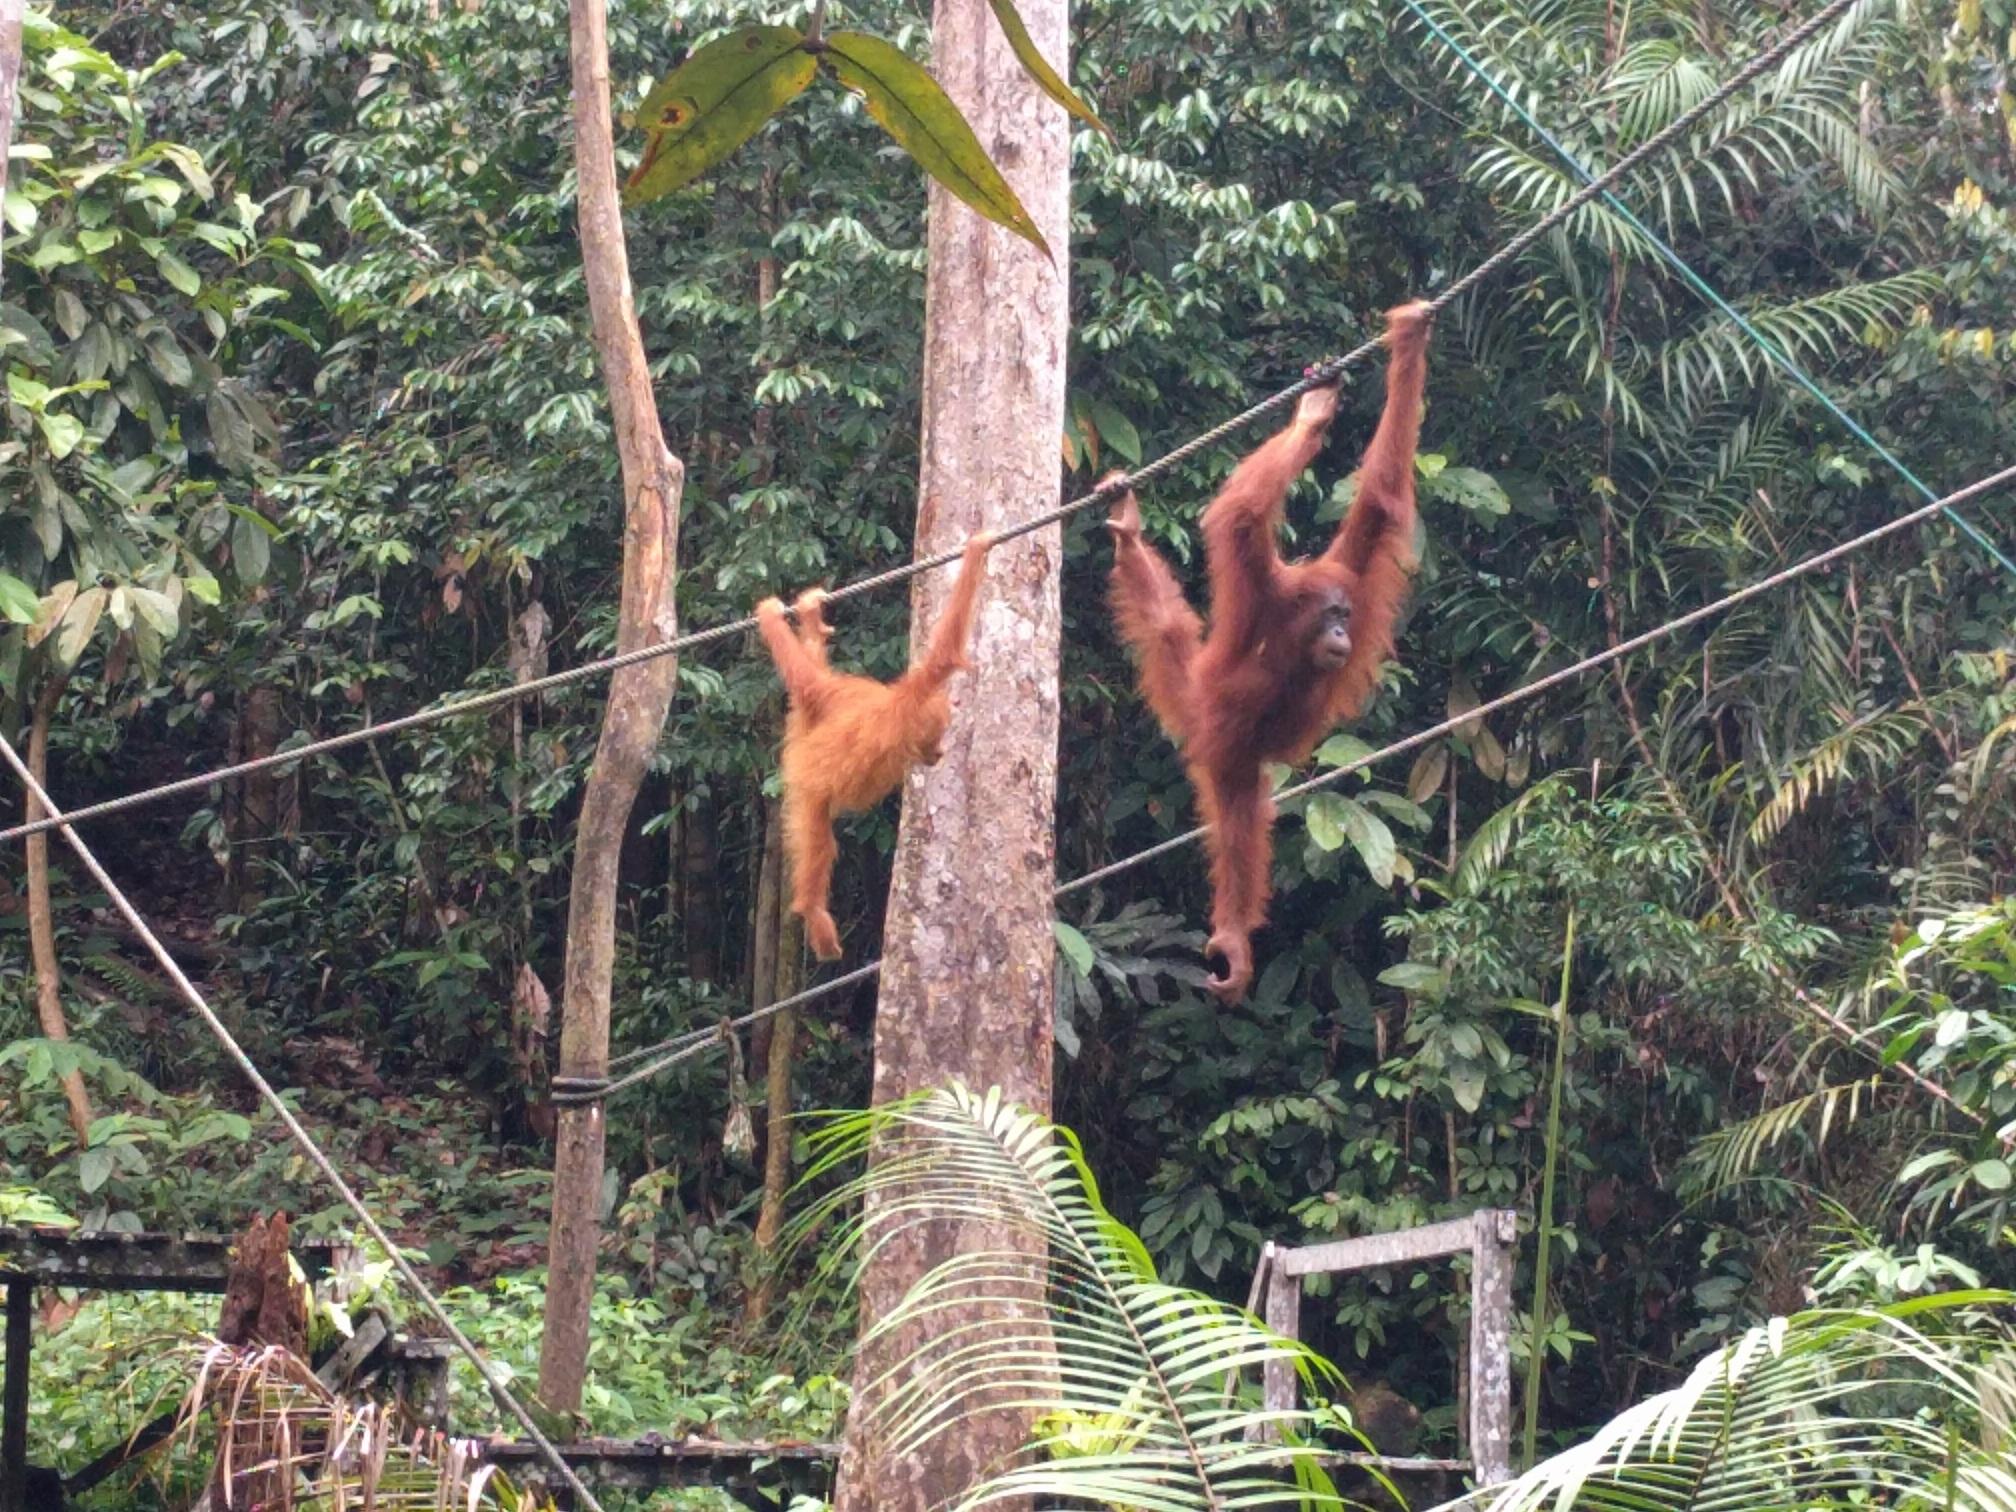 /images/Orangutan2.jpg